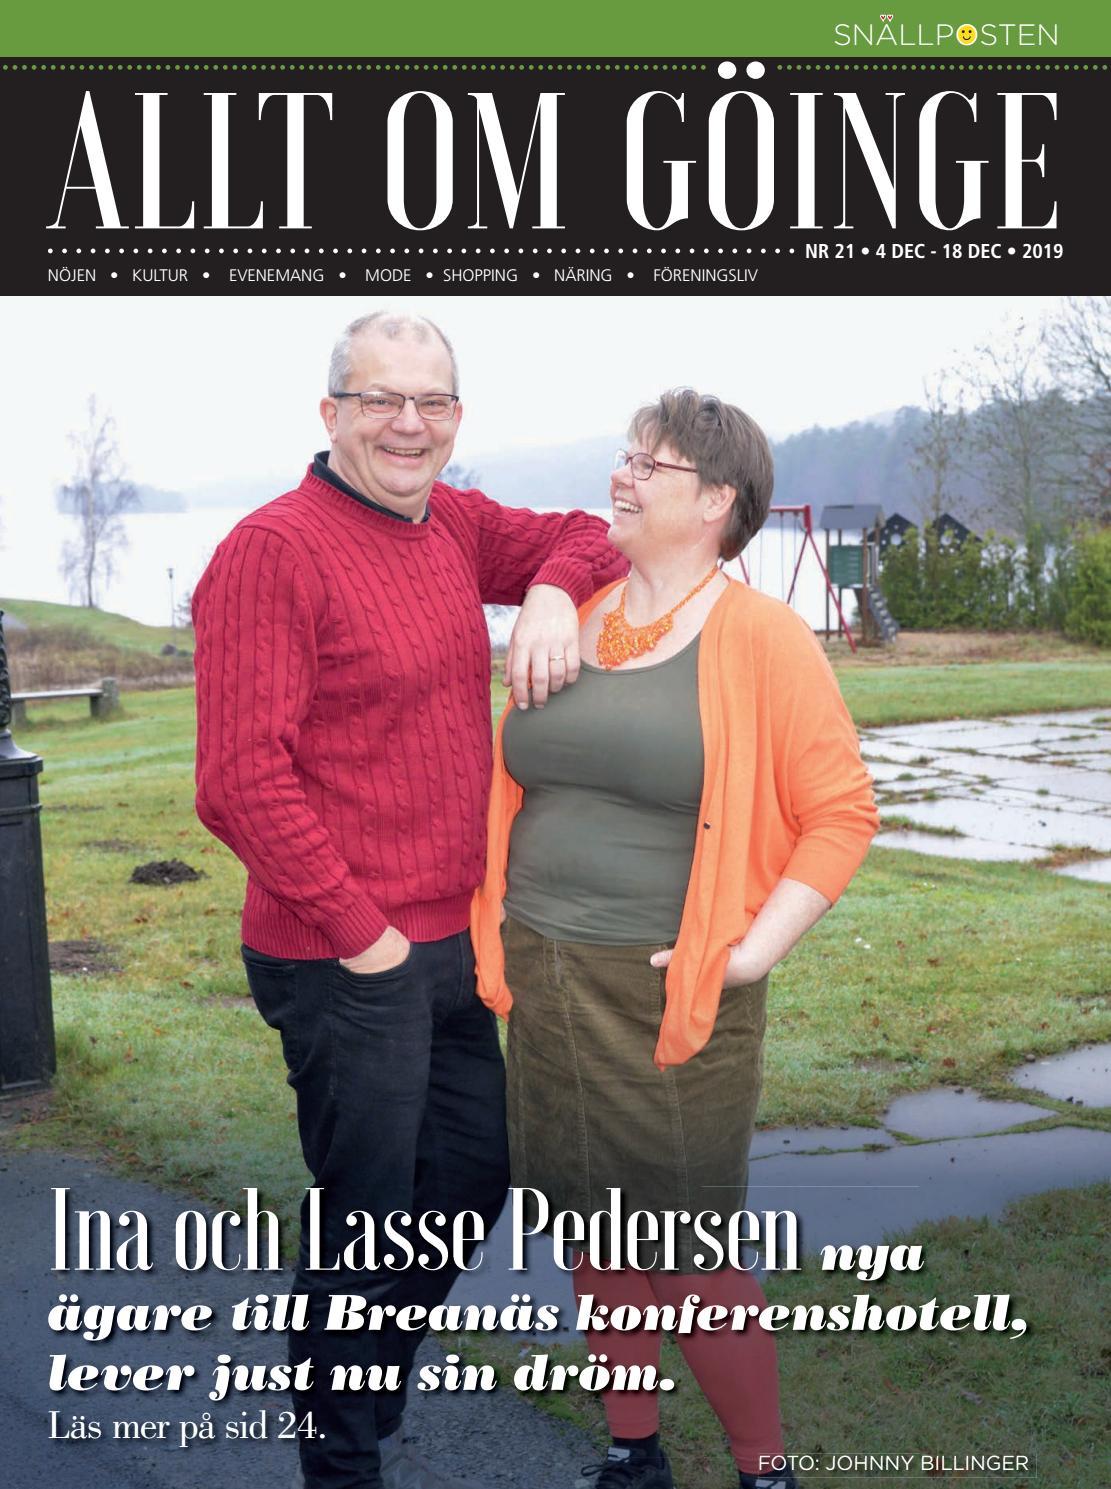 Efterlyser gamla bilder frn Agneberg - Kristianstadsbladet